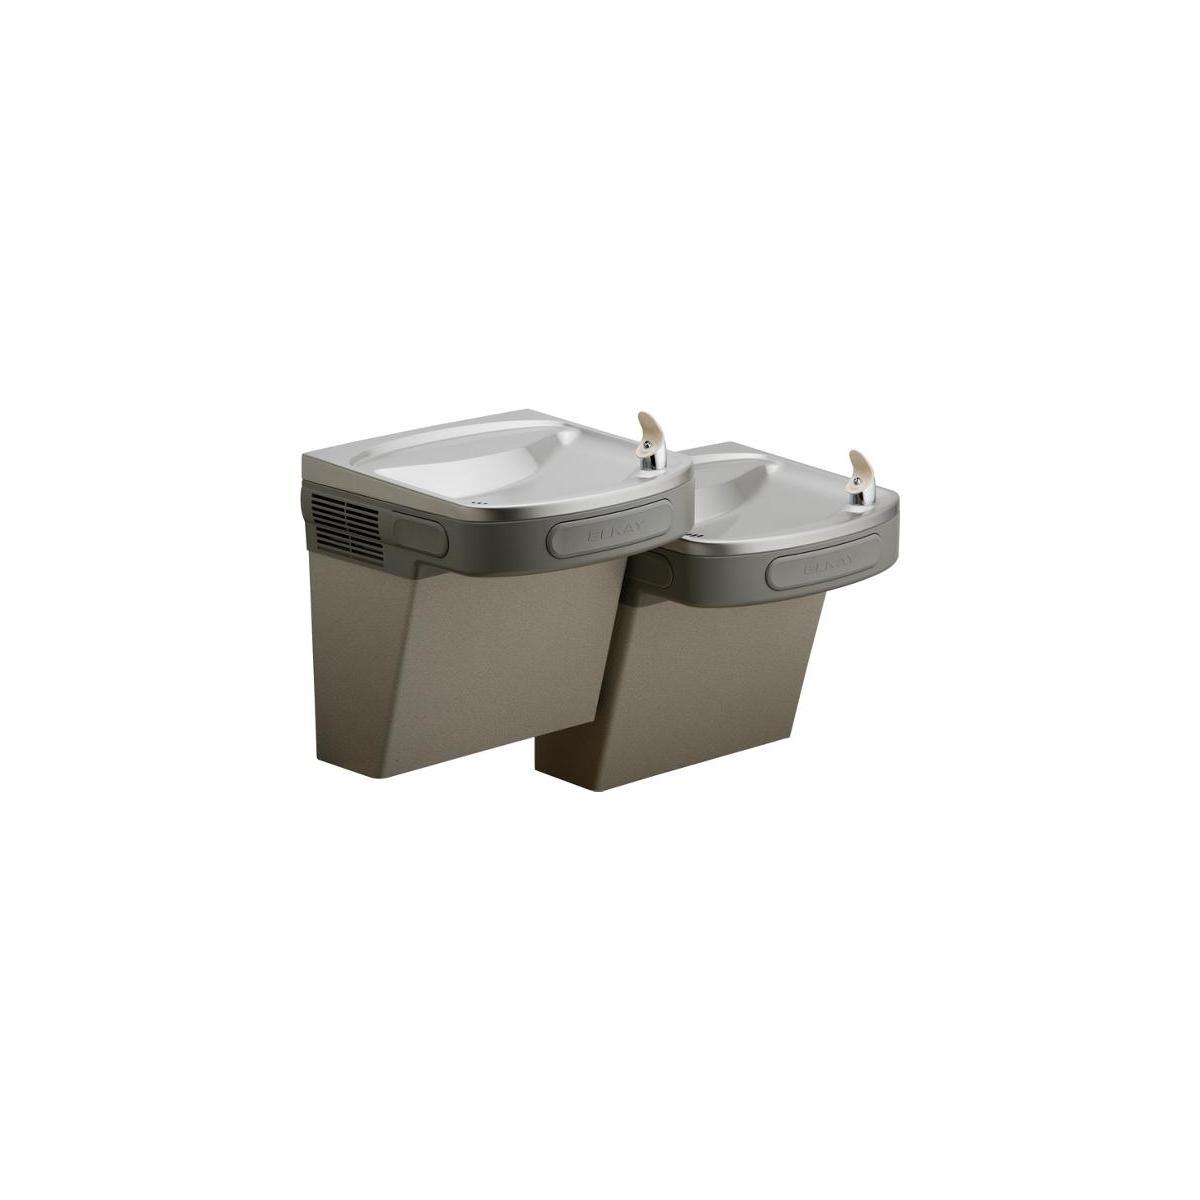 Elkay Versatile Cooler Wall Mount Bi-level ADA Filtered, 8 GPH Light Gray Granite 1281915